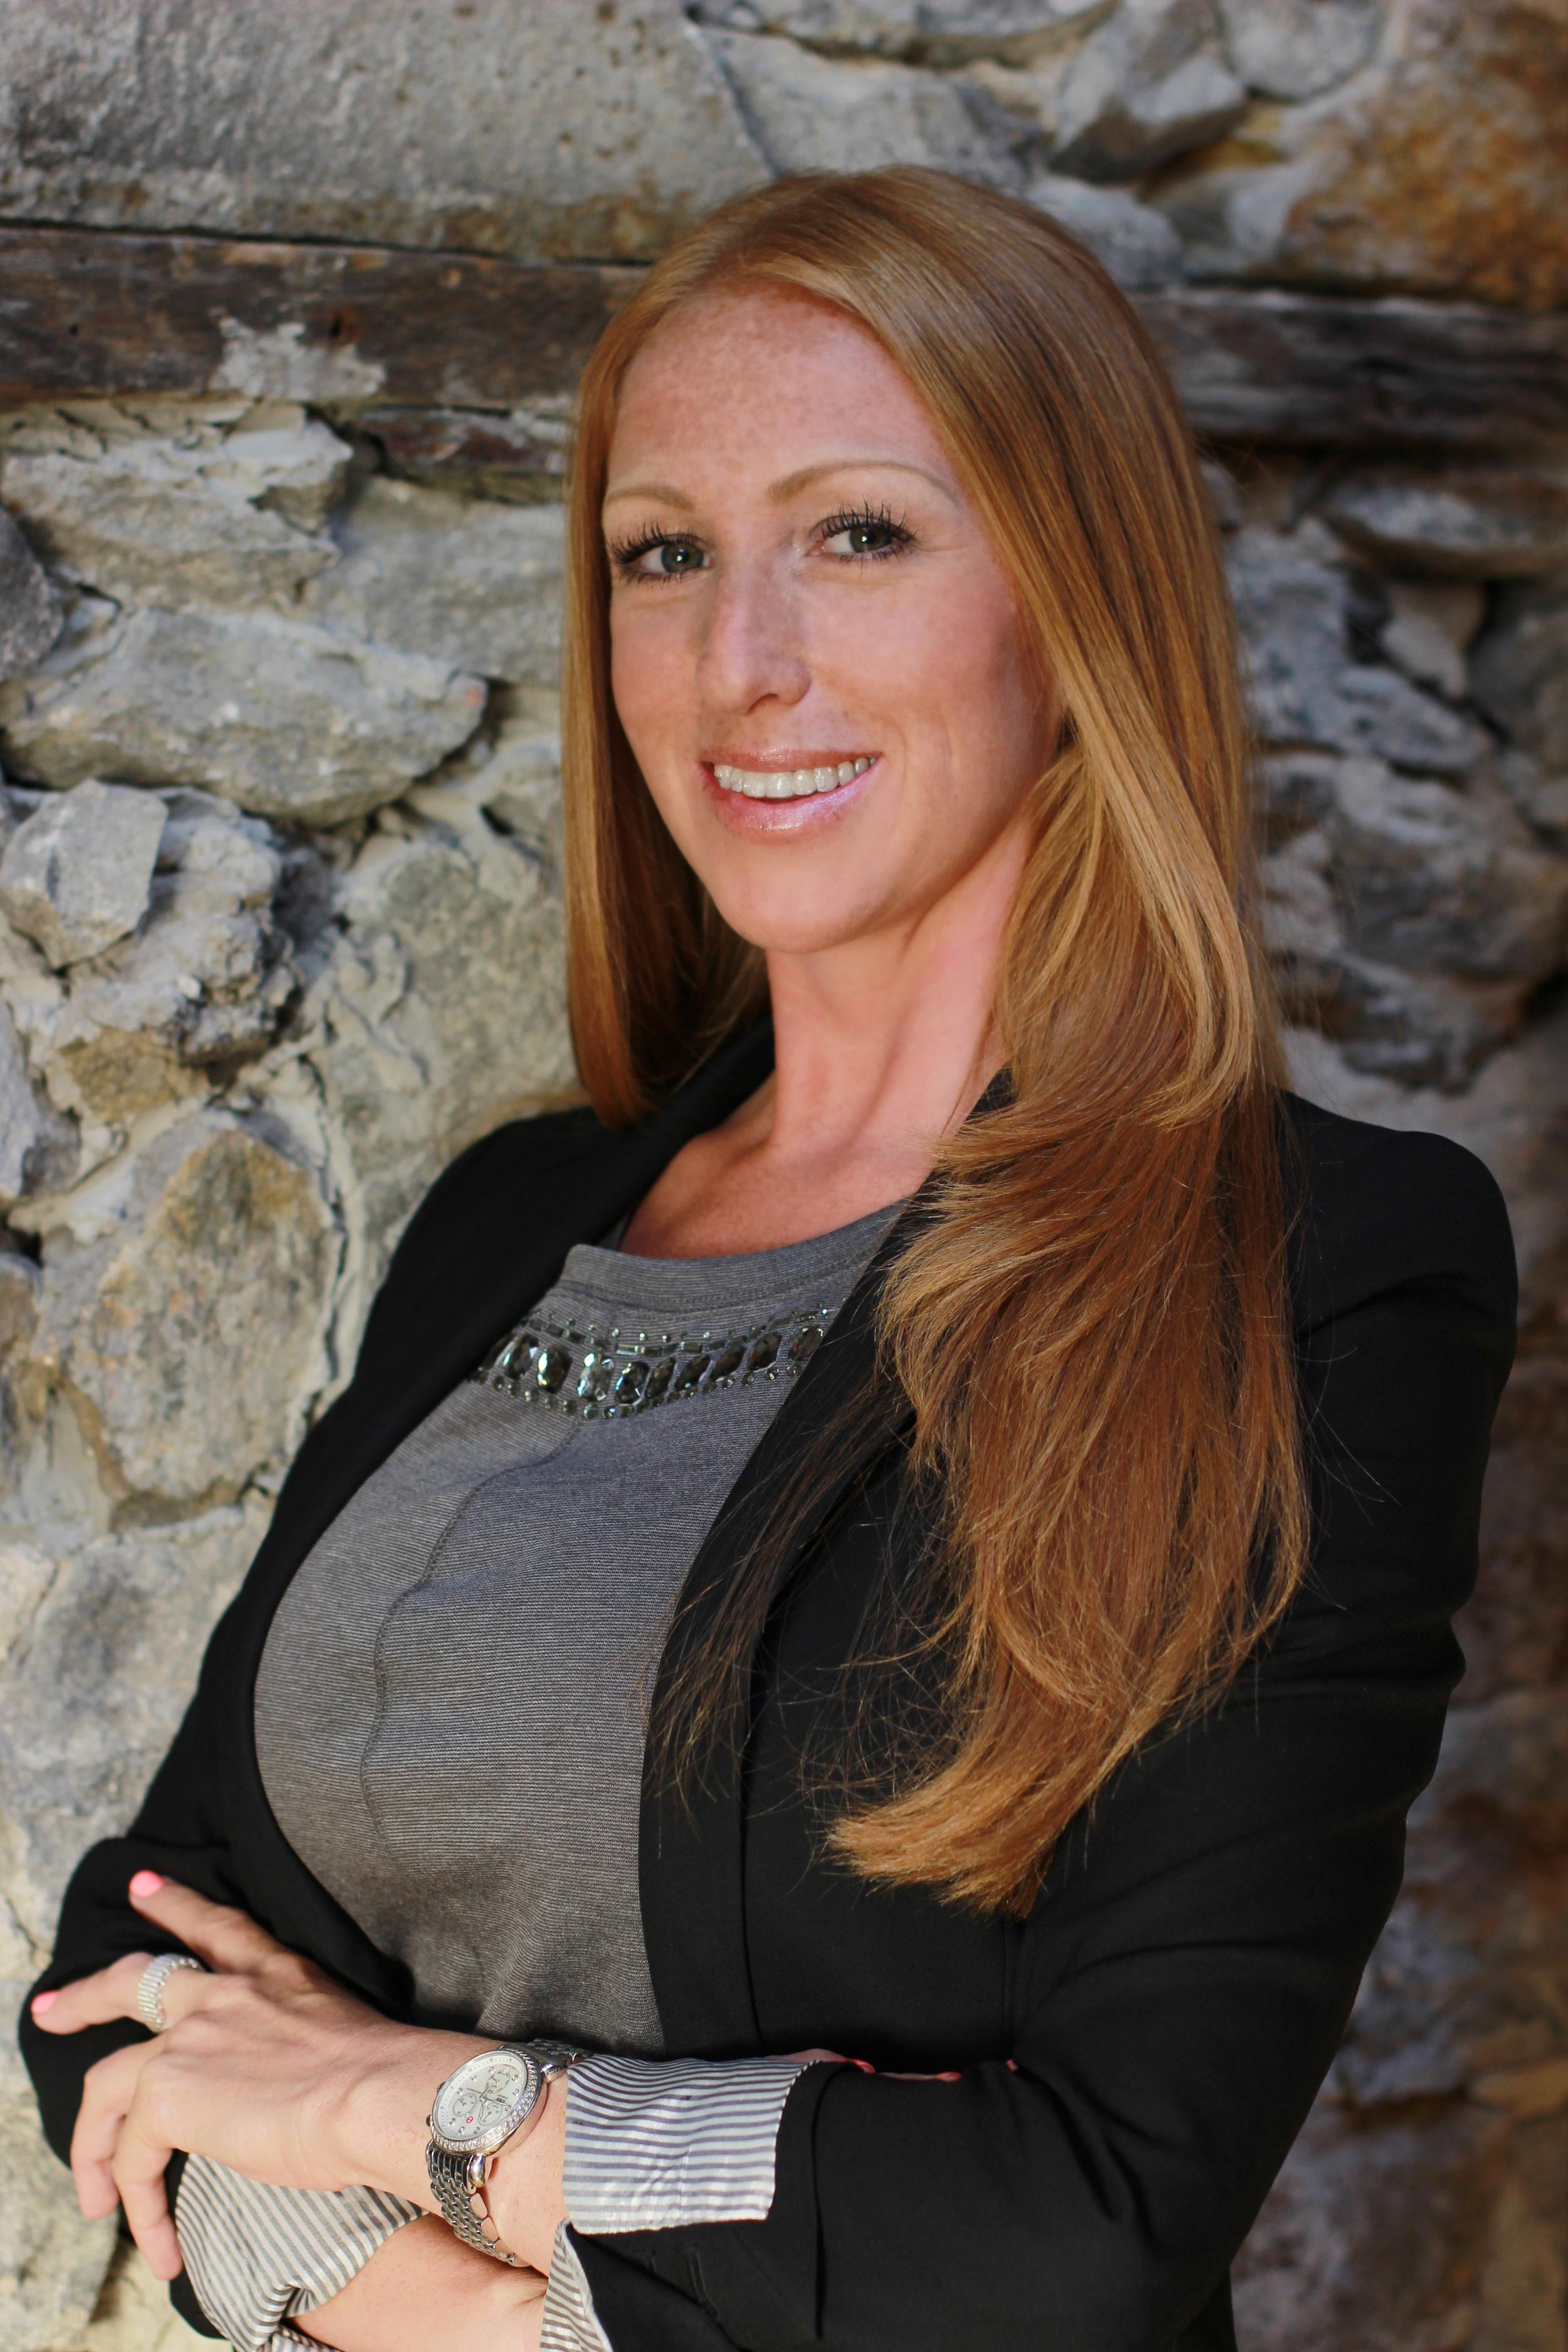 Business Headshot   Attorney - Jess Rudolph Photography: www.jessrudolph.com